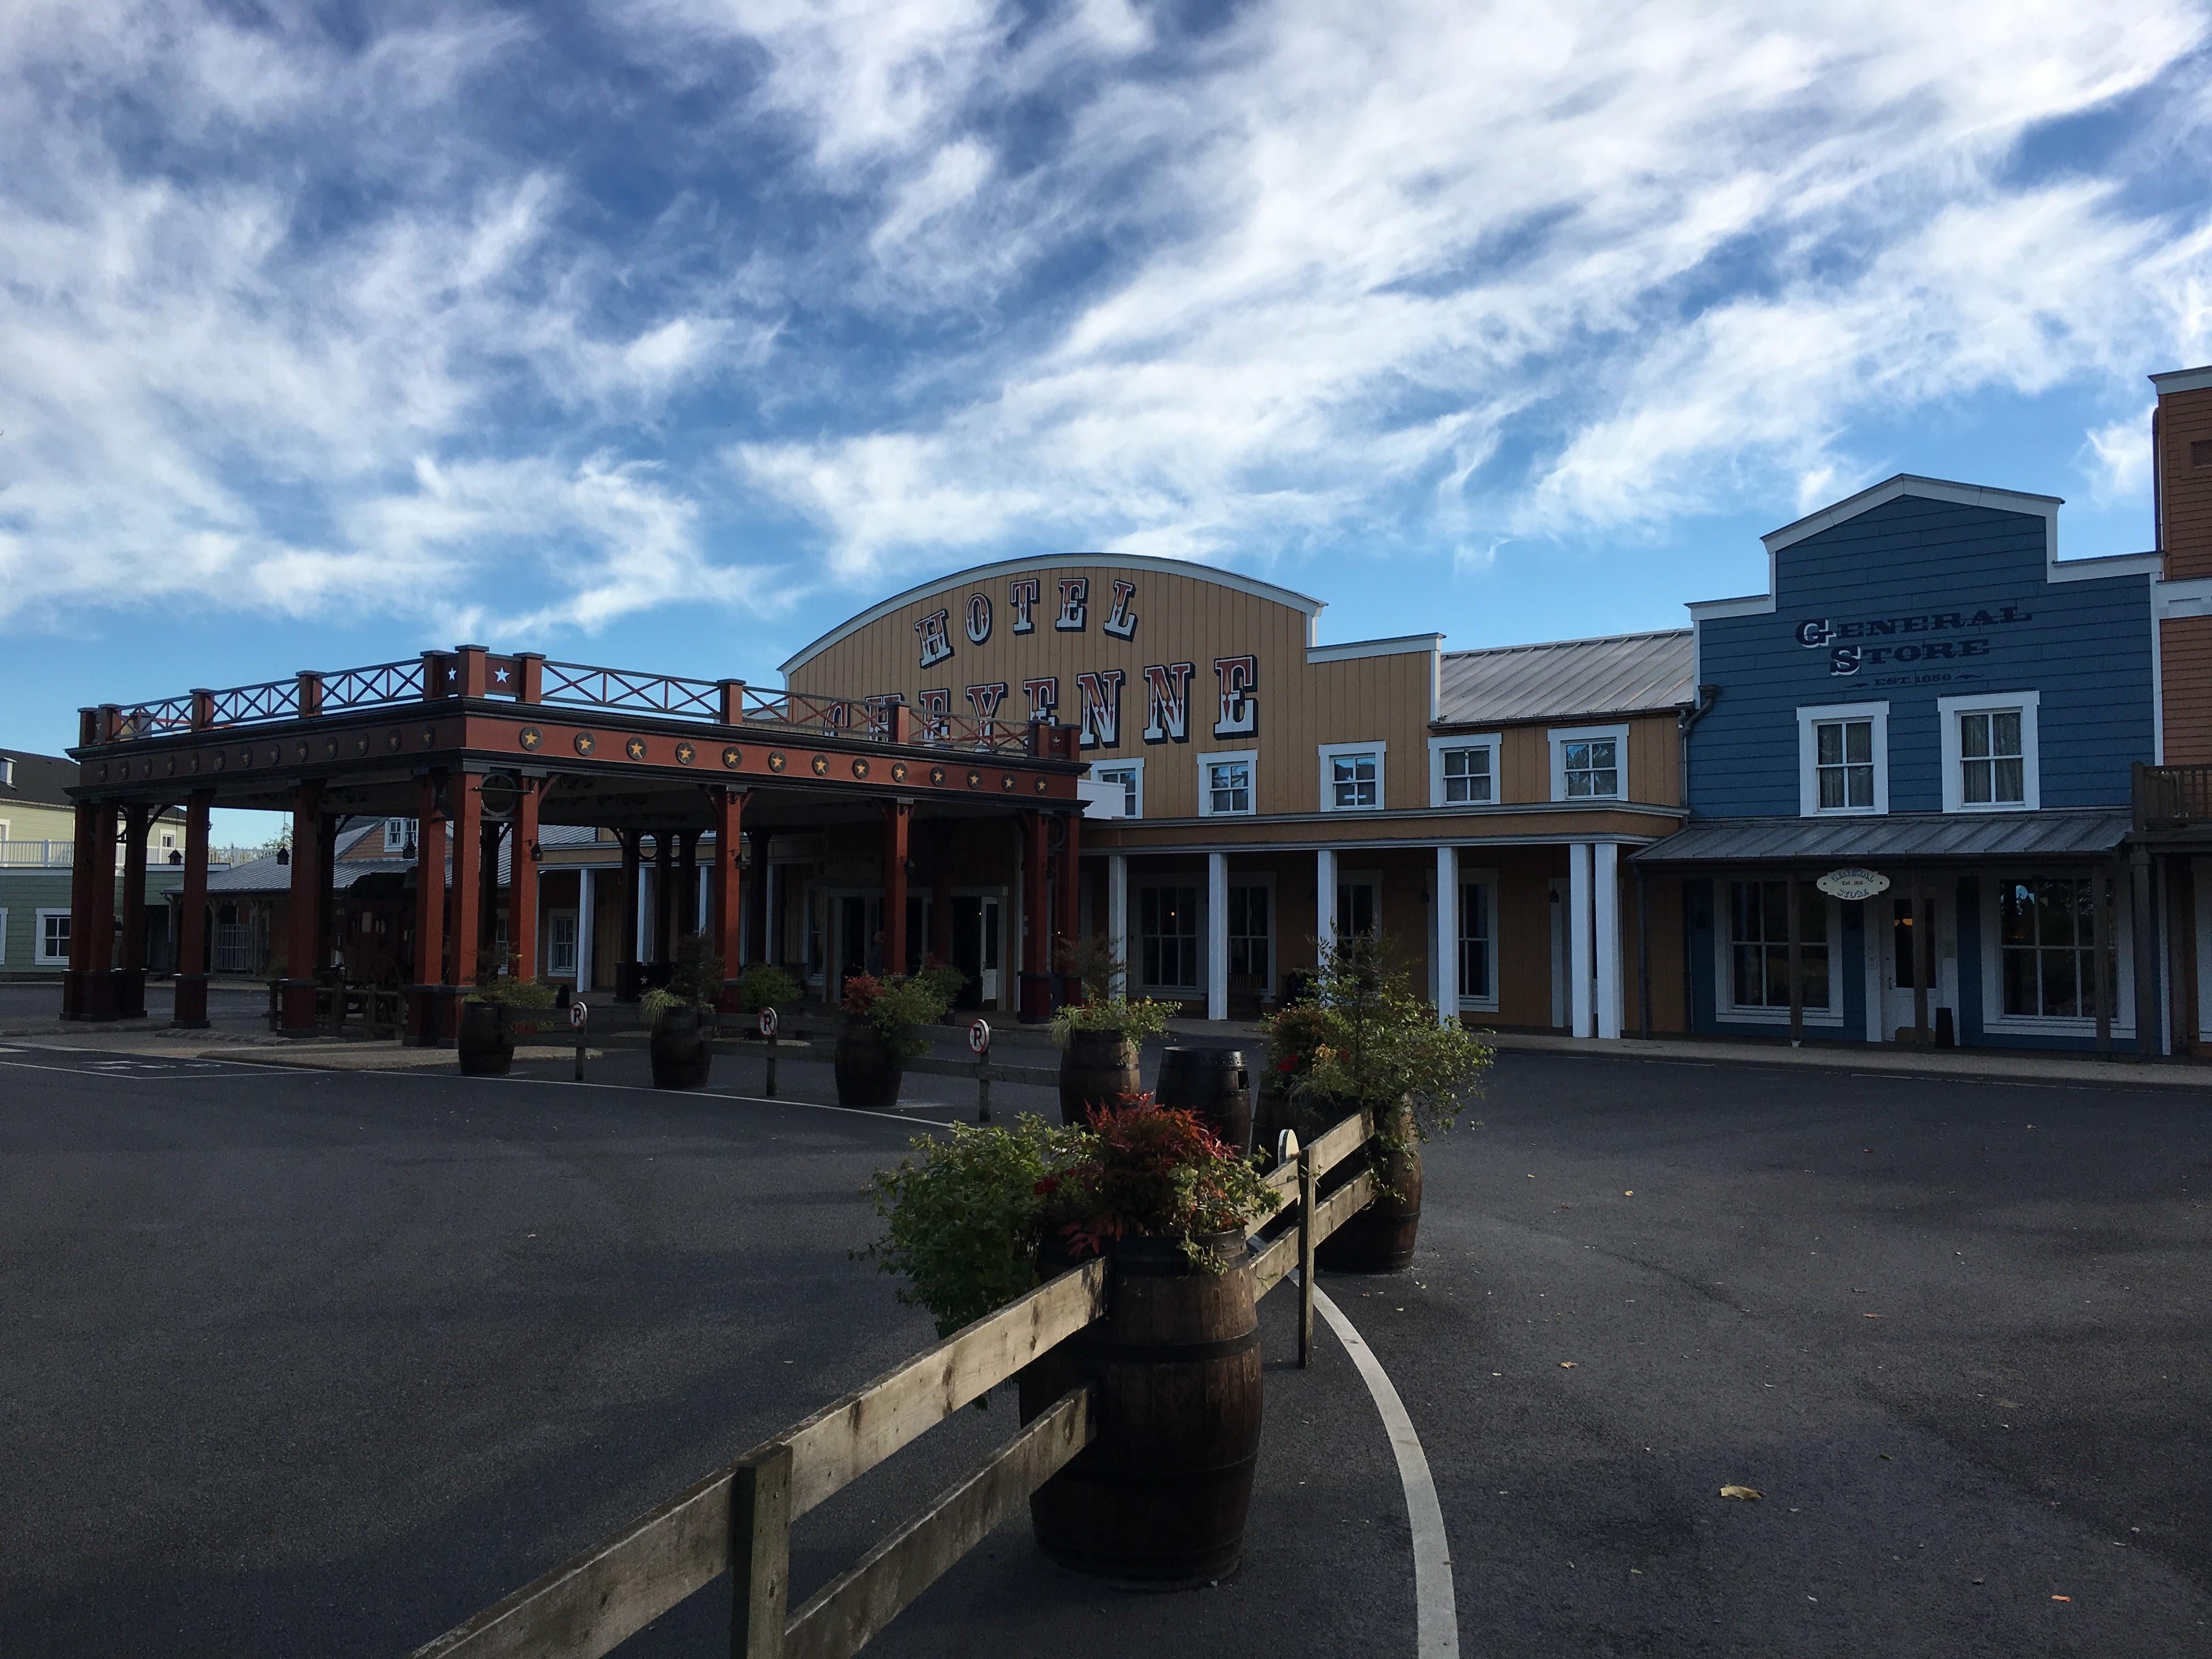 Hotel Cheyenne Entrance Hotel